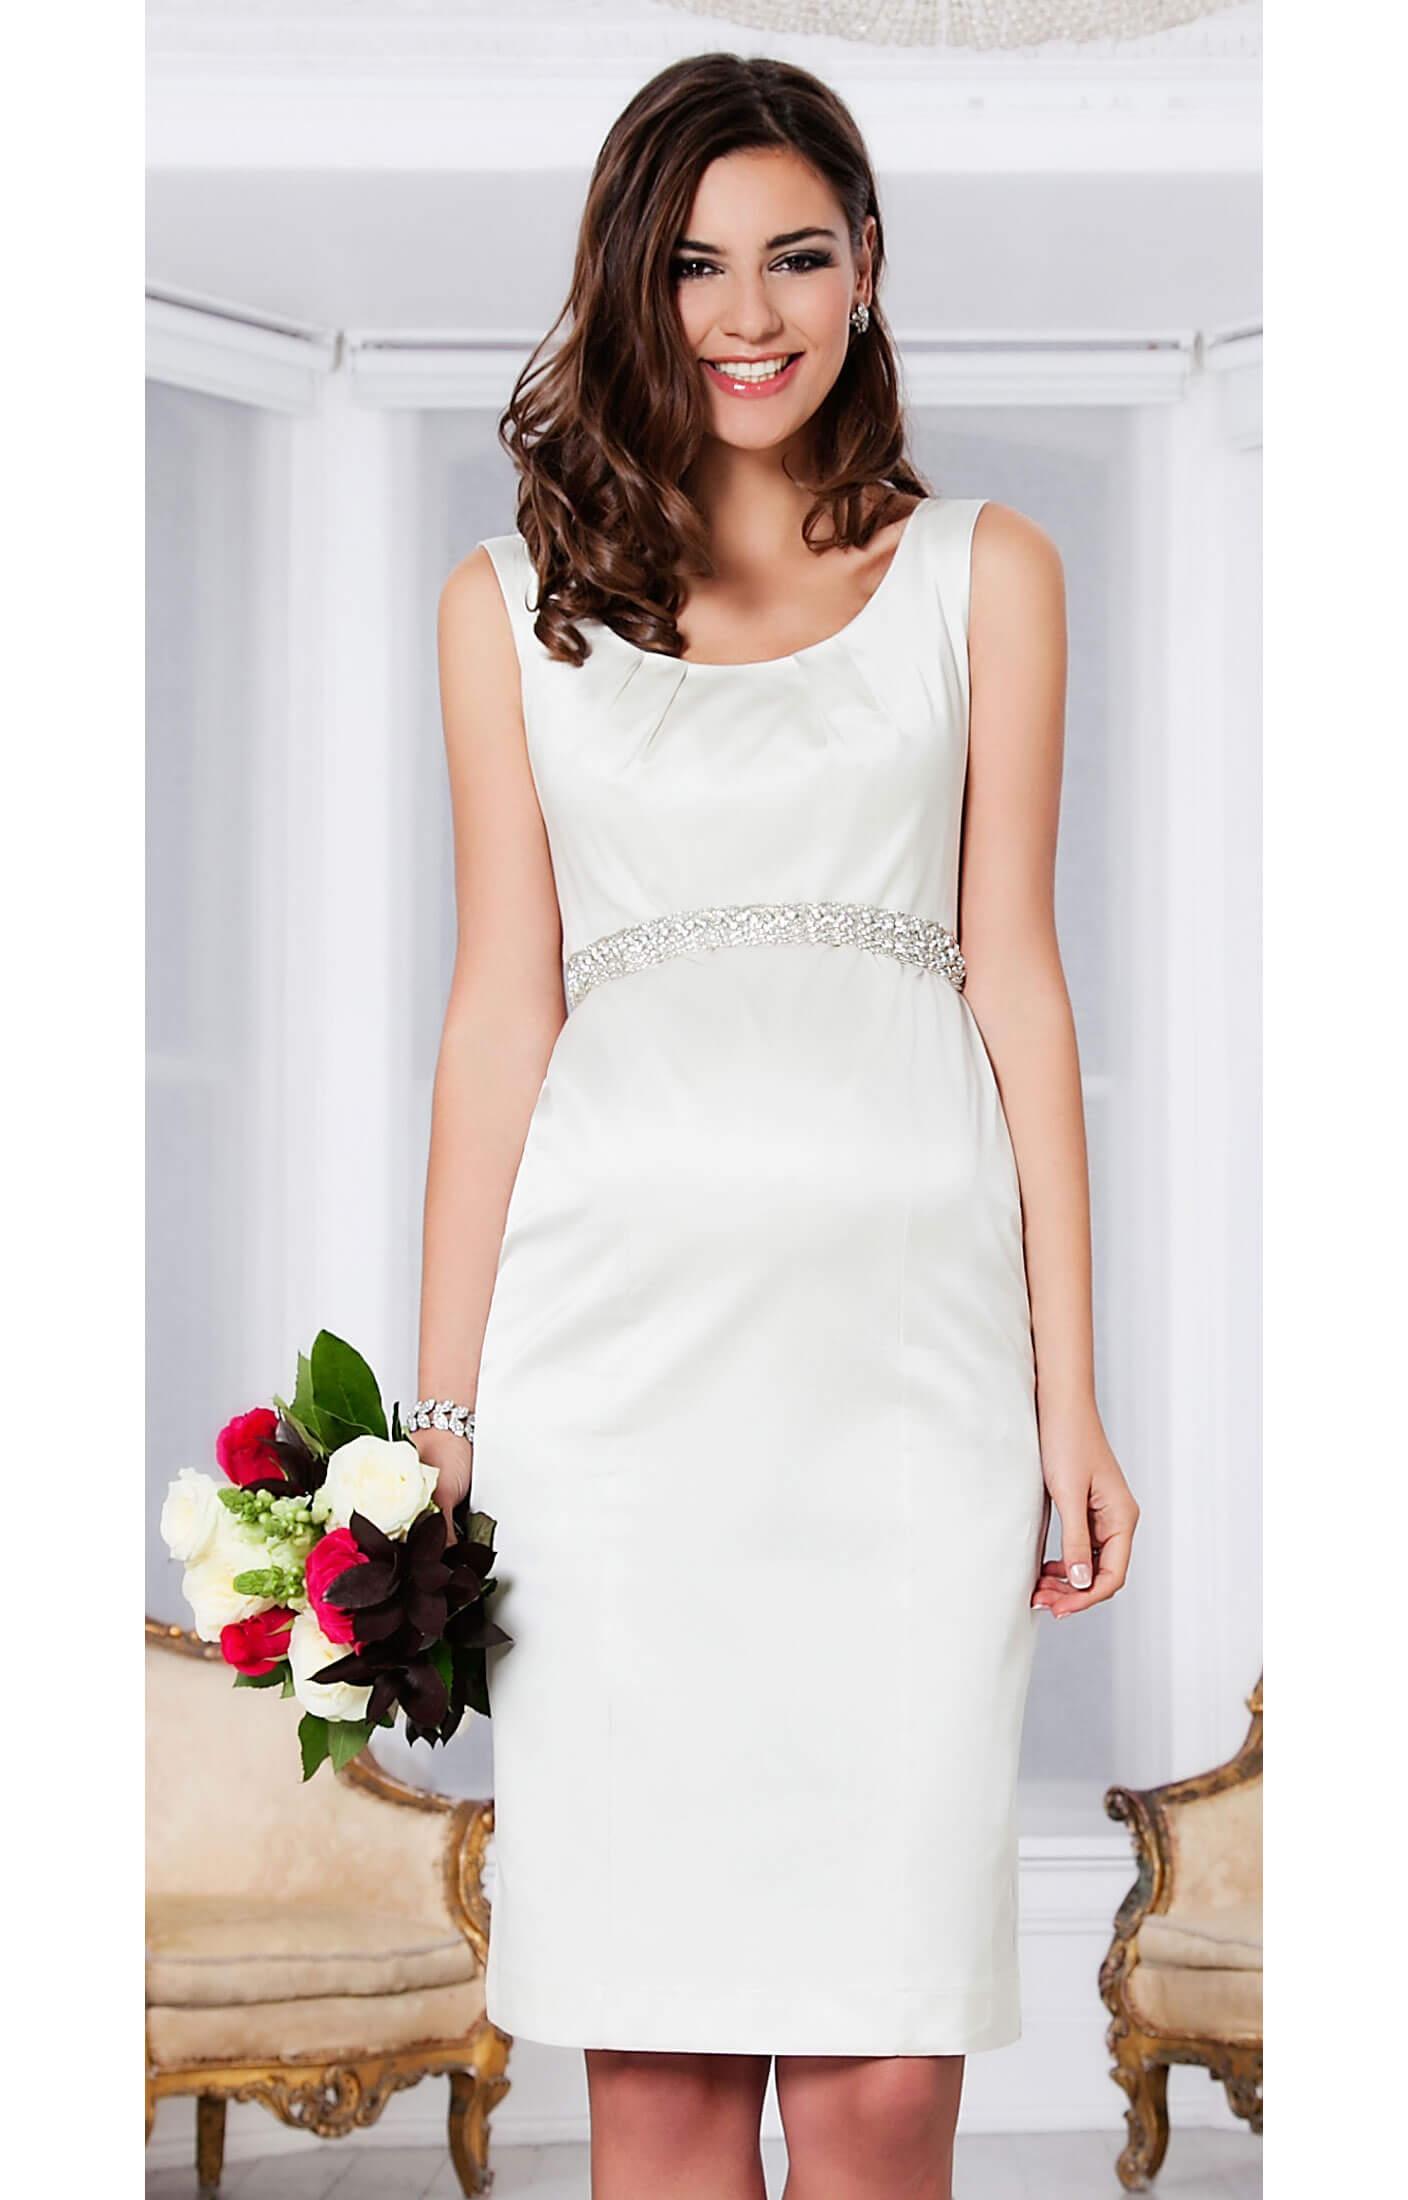 Oria Shift Maternity Dress (Pearl Ivory) ivory wedding dress Oria Shift Maternity Dress Pearl Ivory by Tiffany Rose